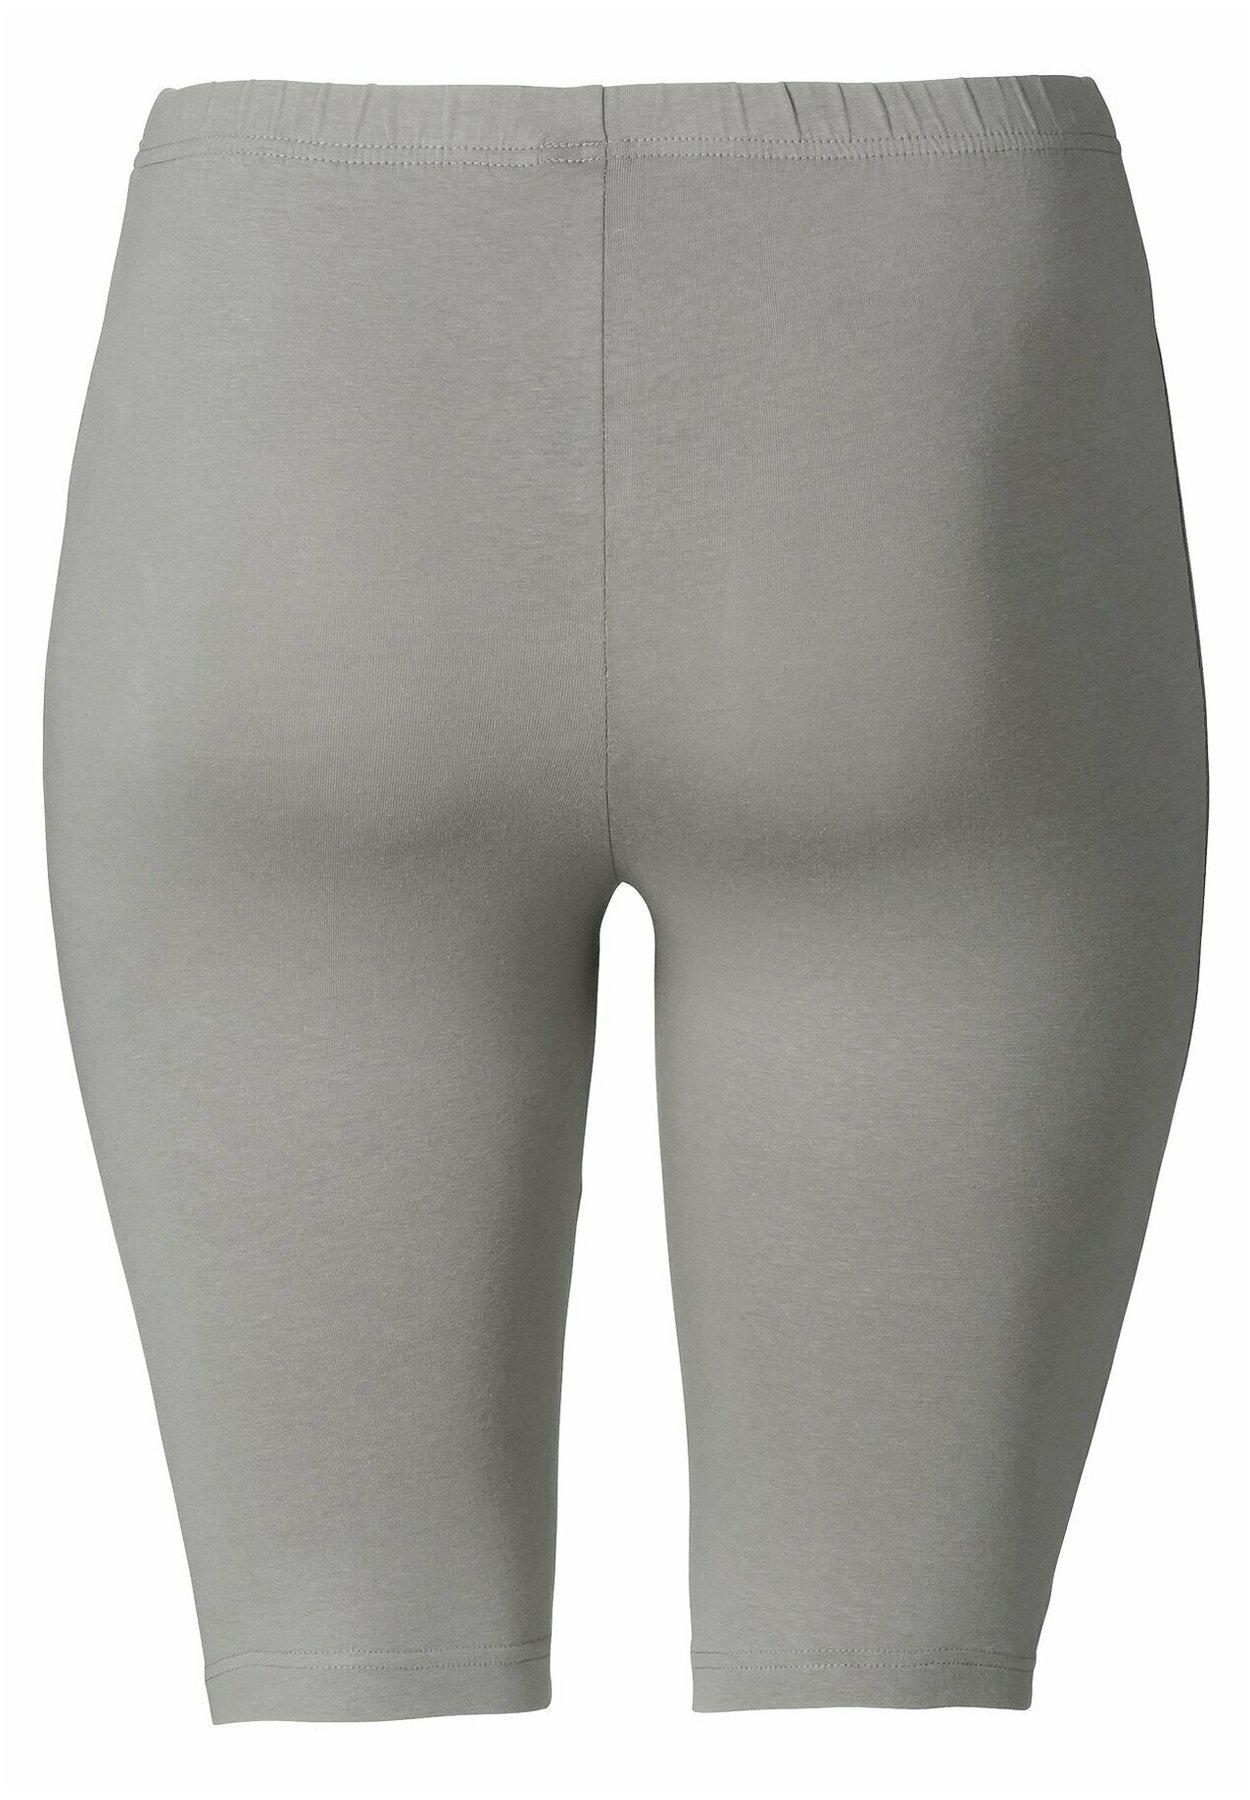 Damen kurze Sporthose